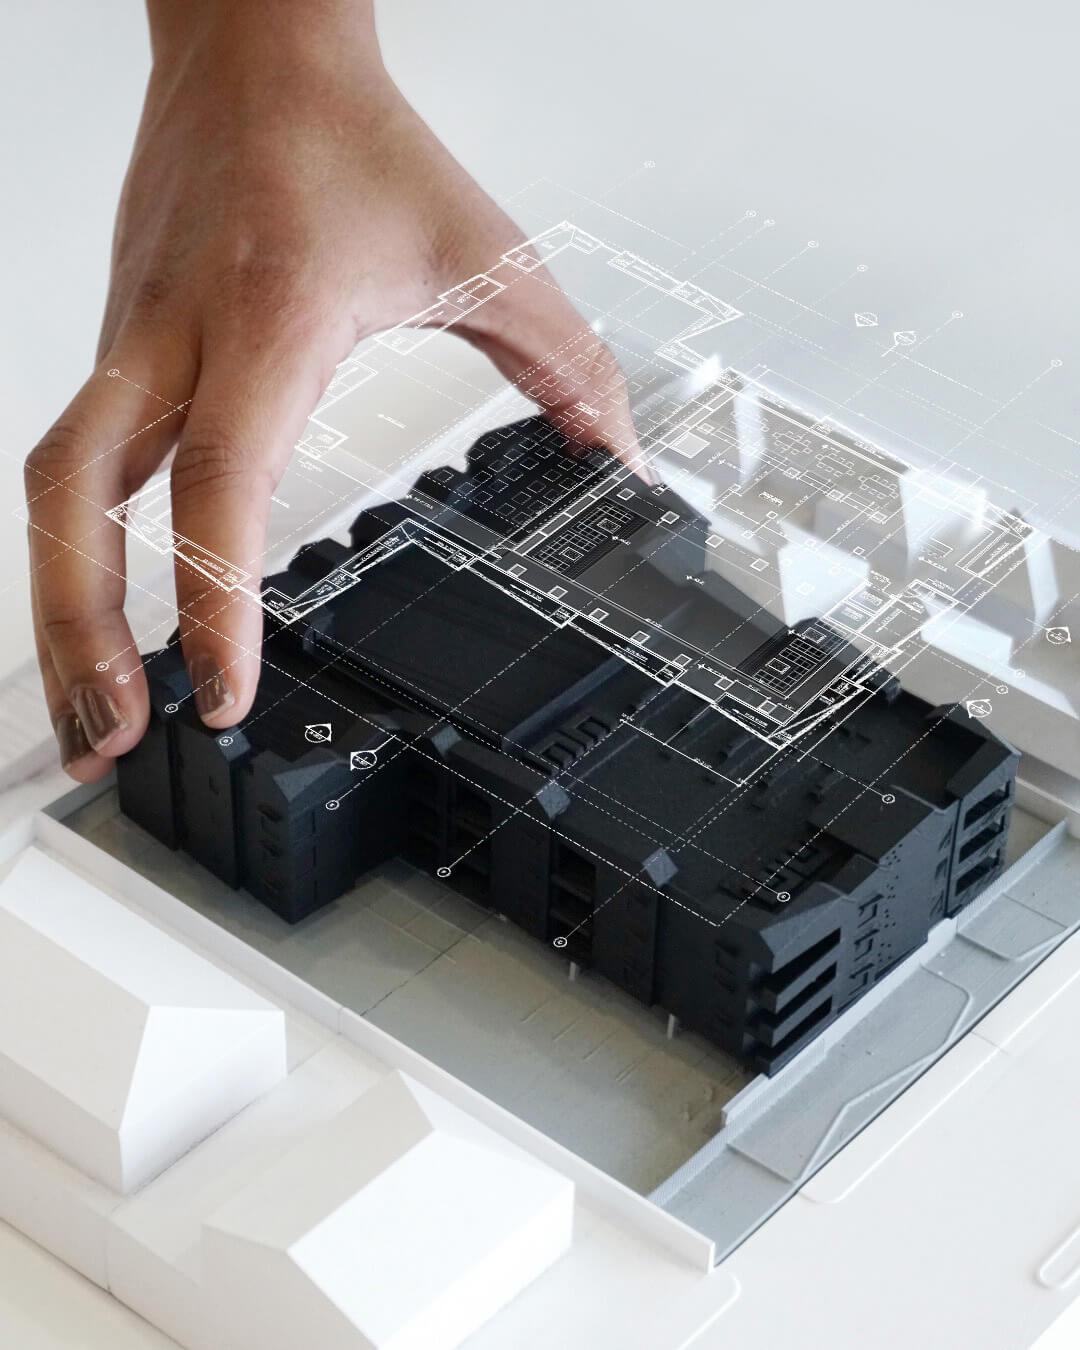 Model of building designed by architect Laney LA